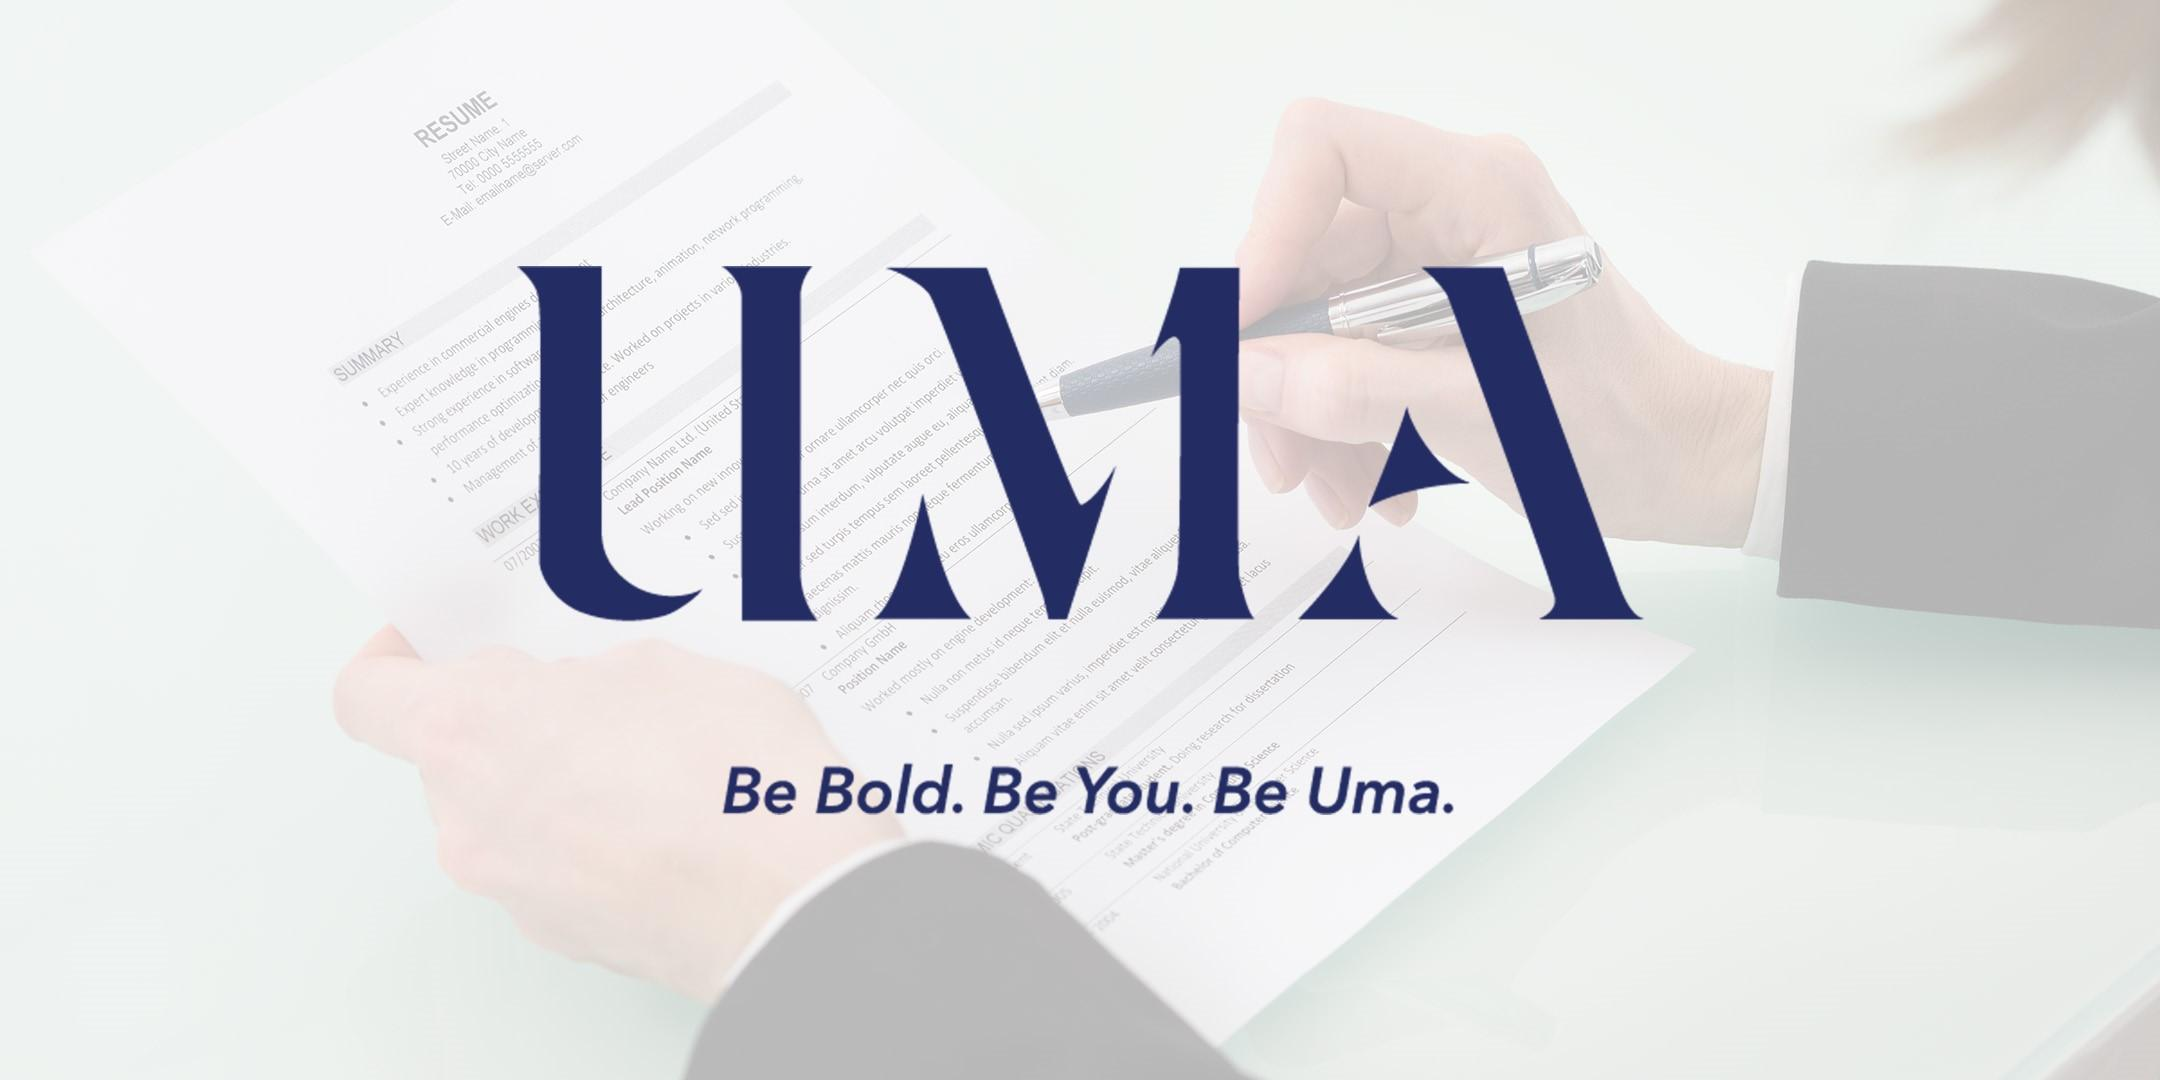 Rsum 101 Managing Your Career Gap 1 Mar 2018